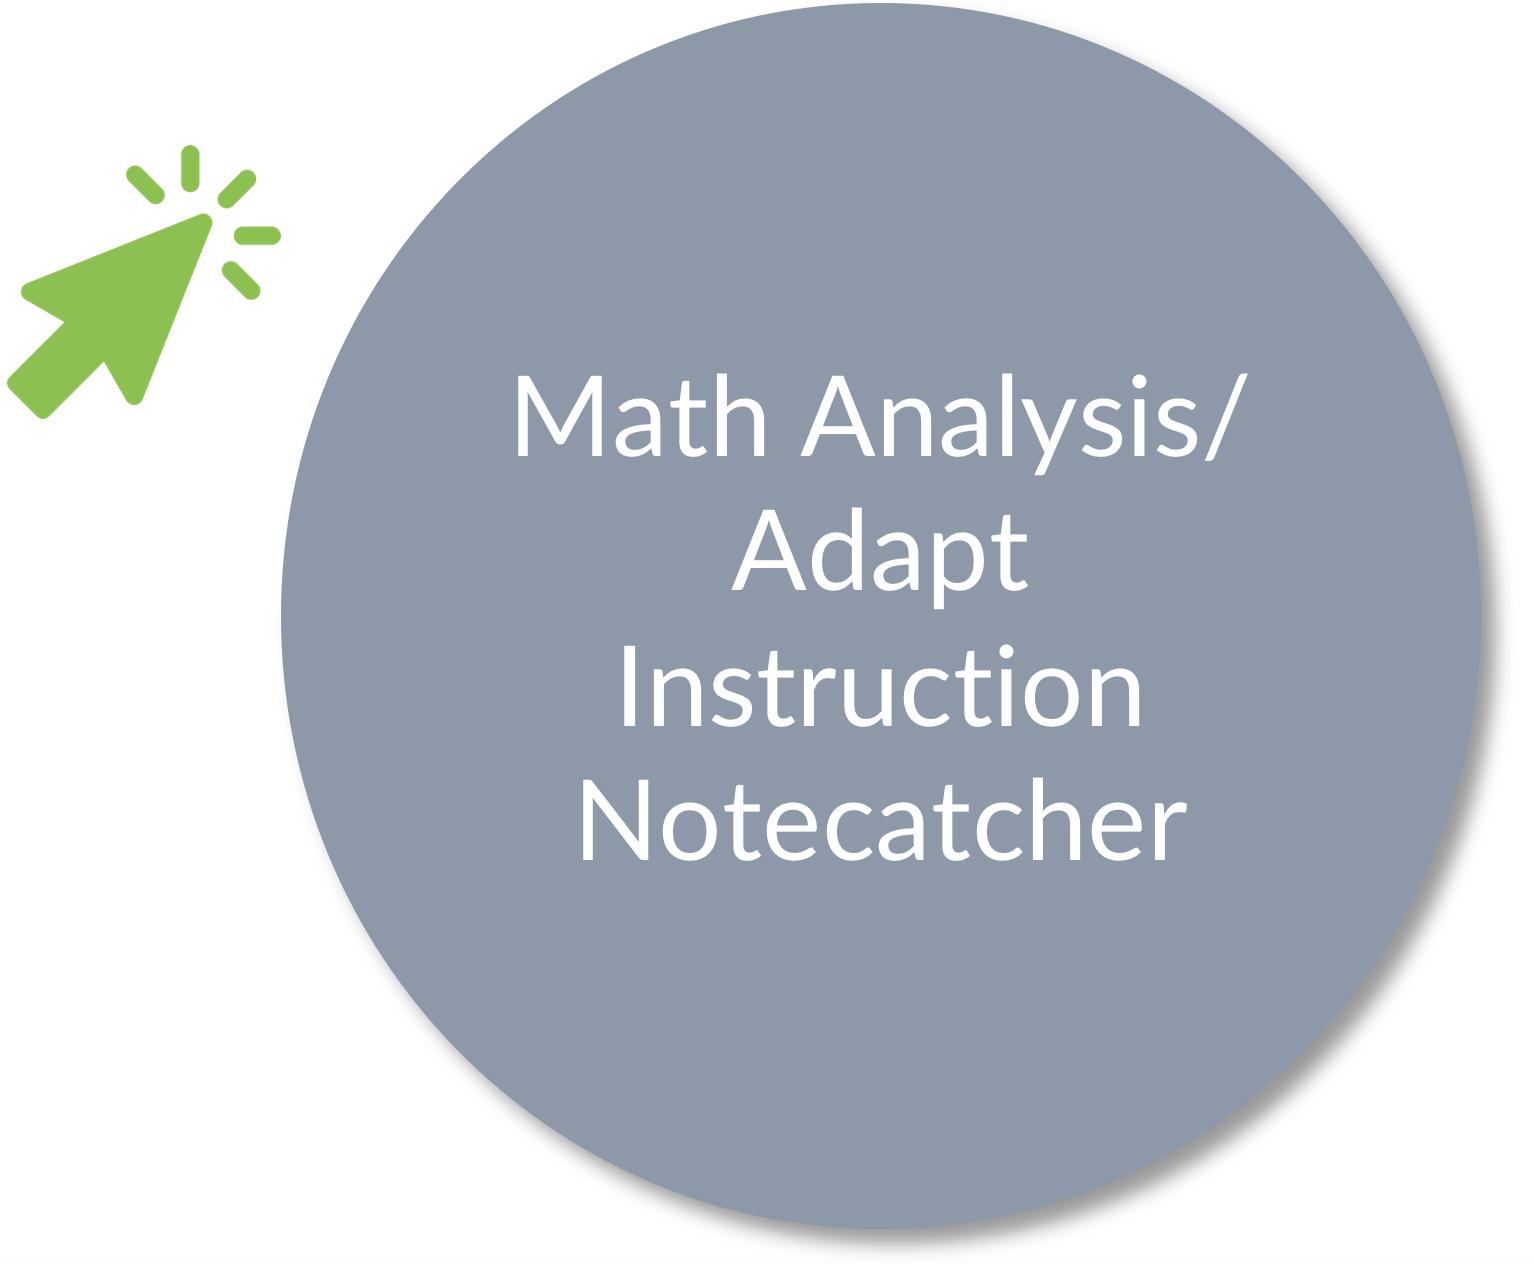 math analysis adapt instruction notecatcher